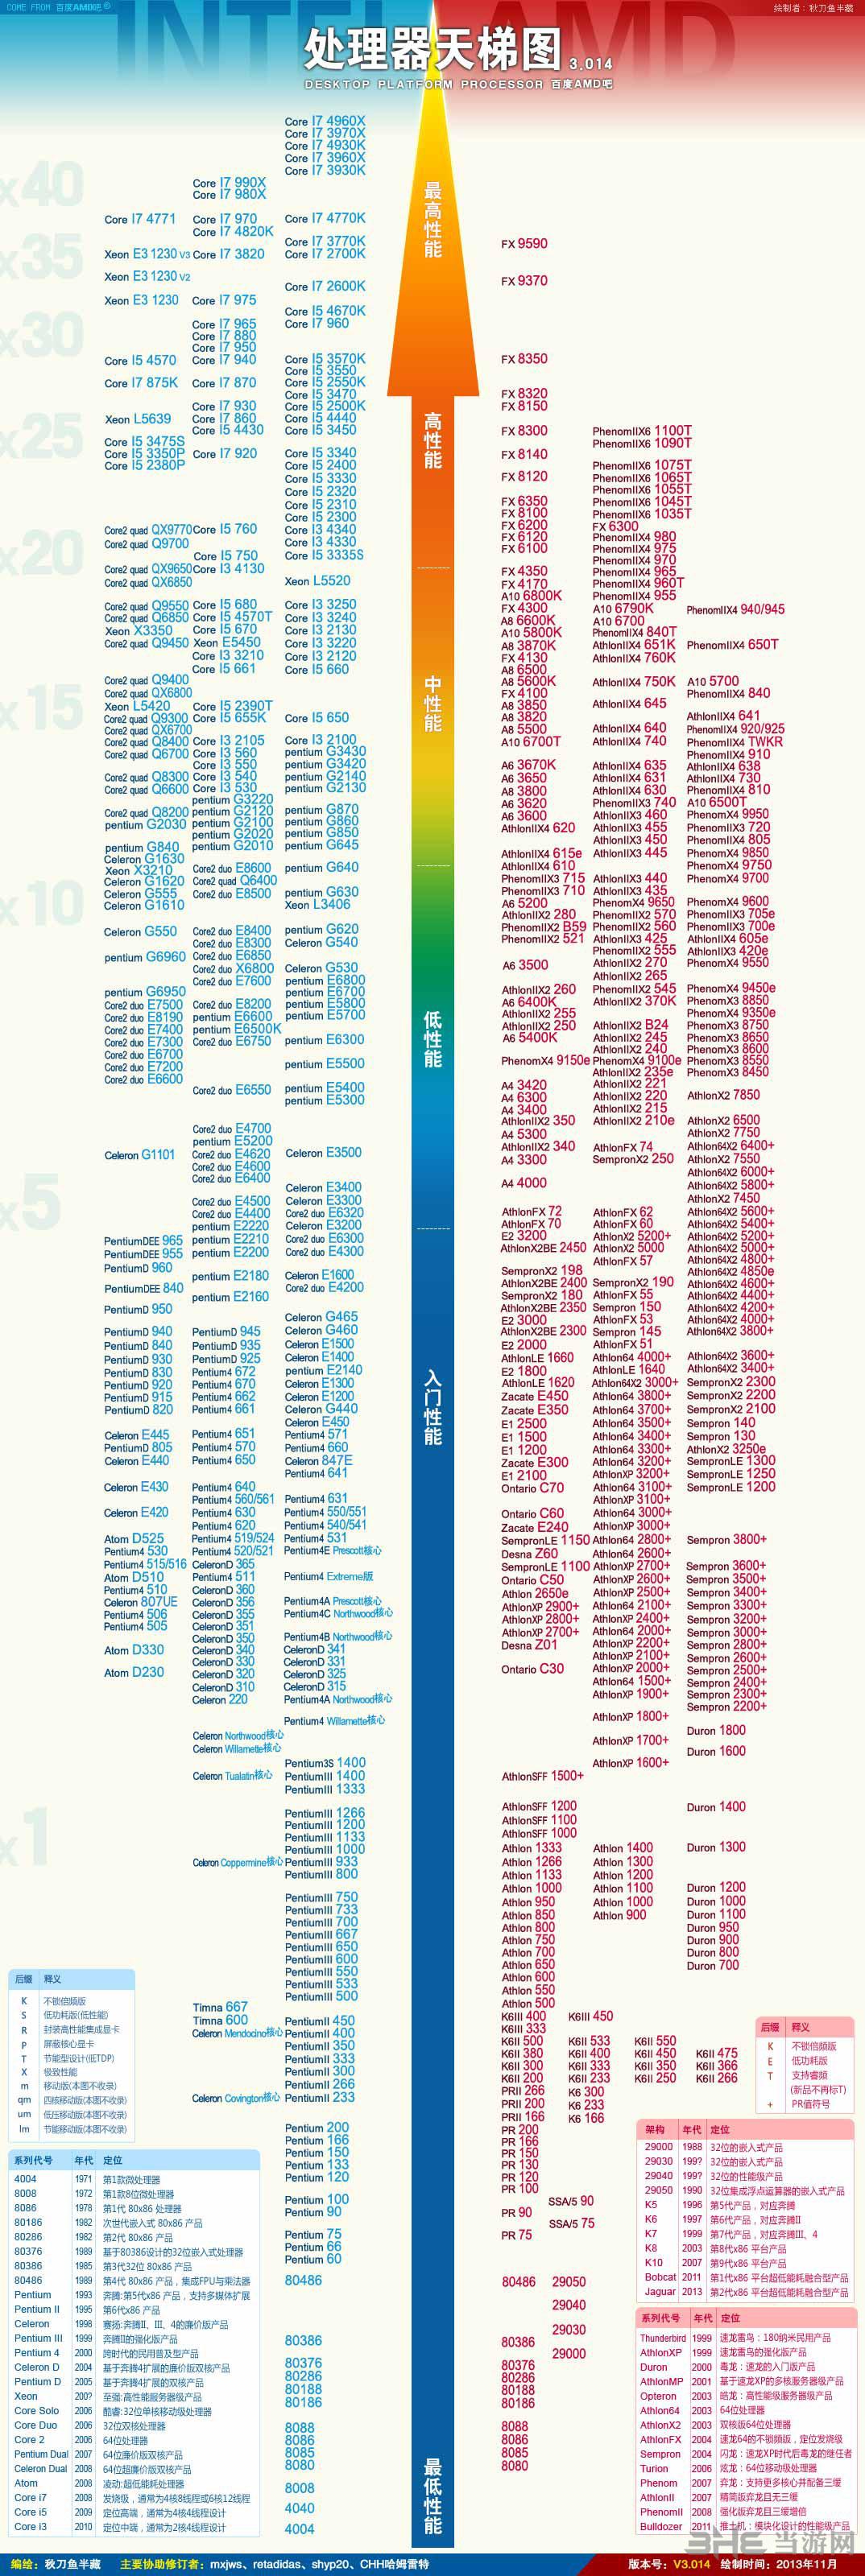 CPU 显卡 主板天梯图2013年最新 电脑硬件知识扫盲大全